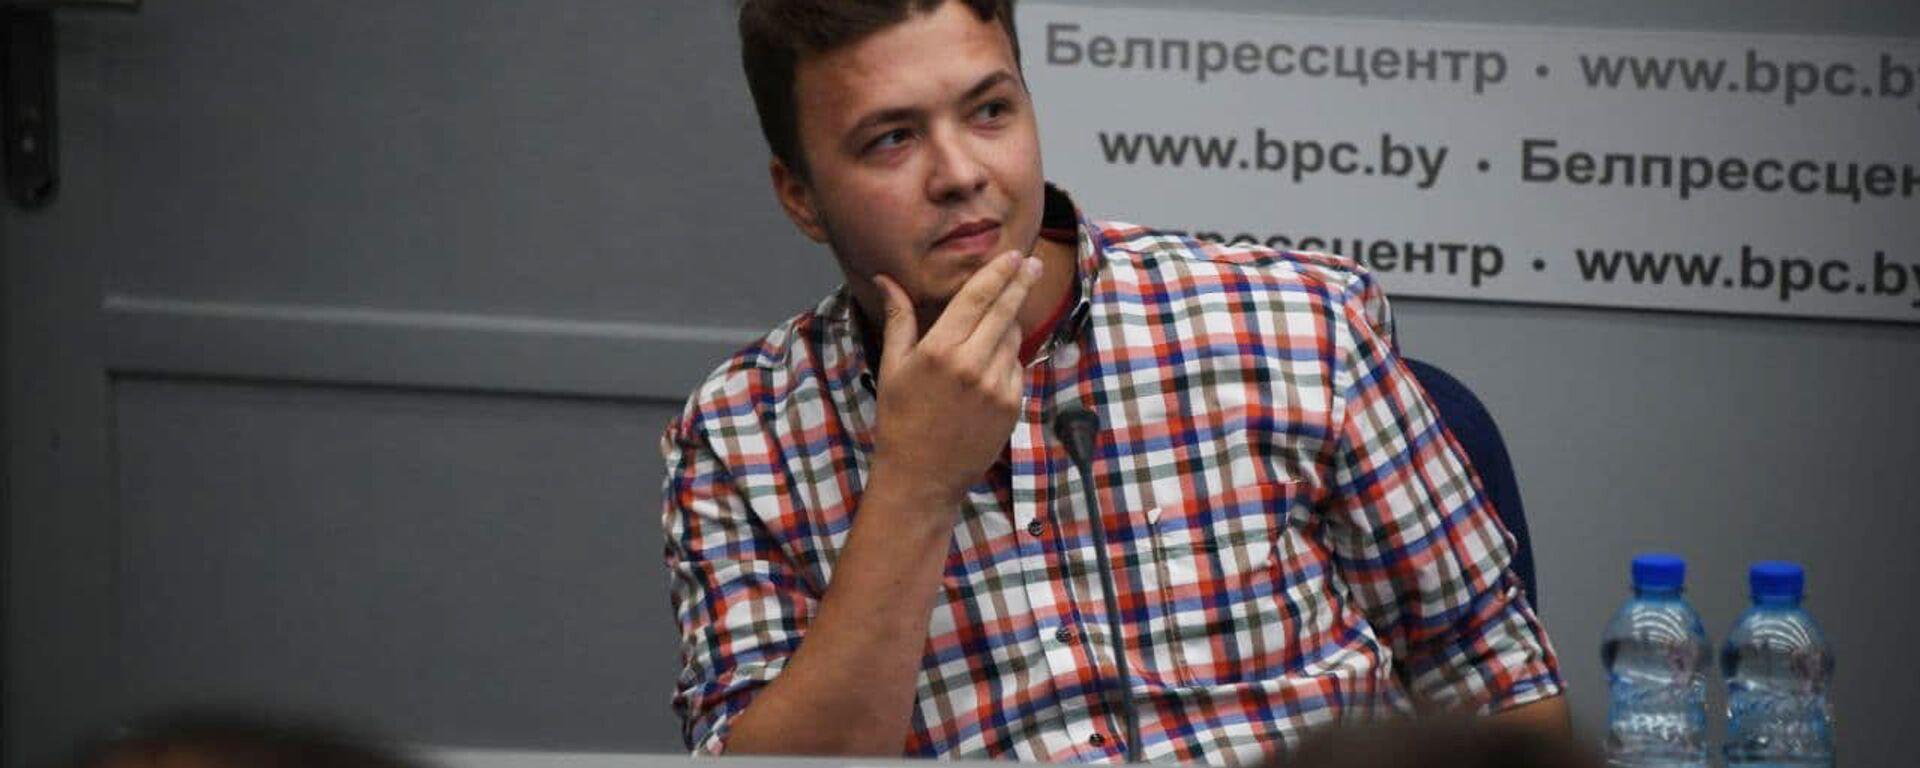 Раман Пратасевіч - Sputnik Беларусь, 1920, 08.07.2021